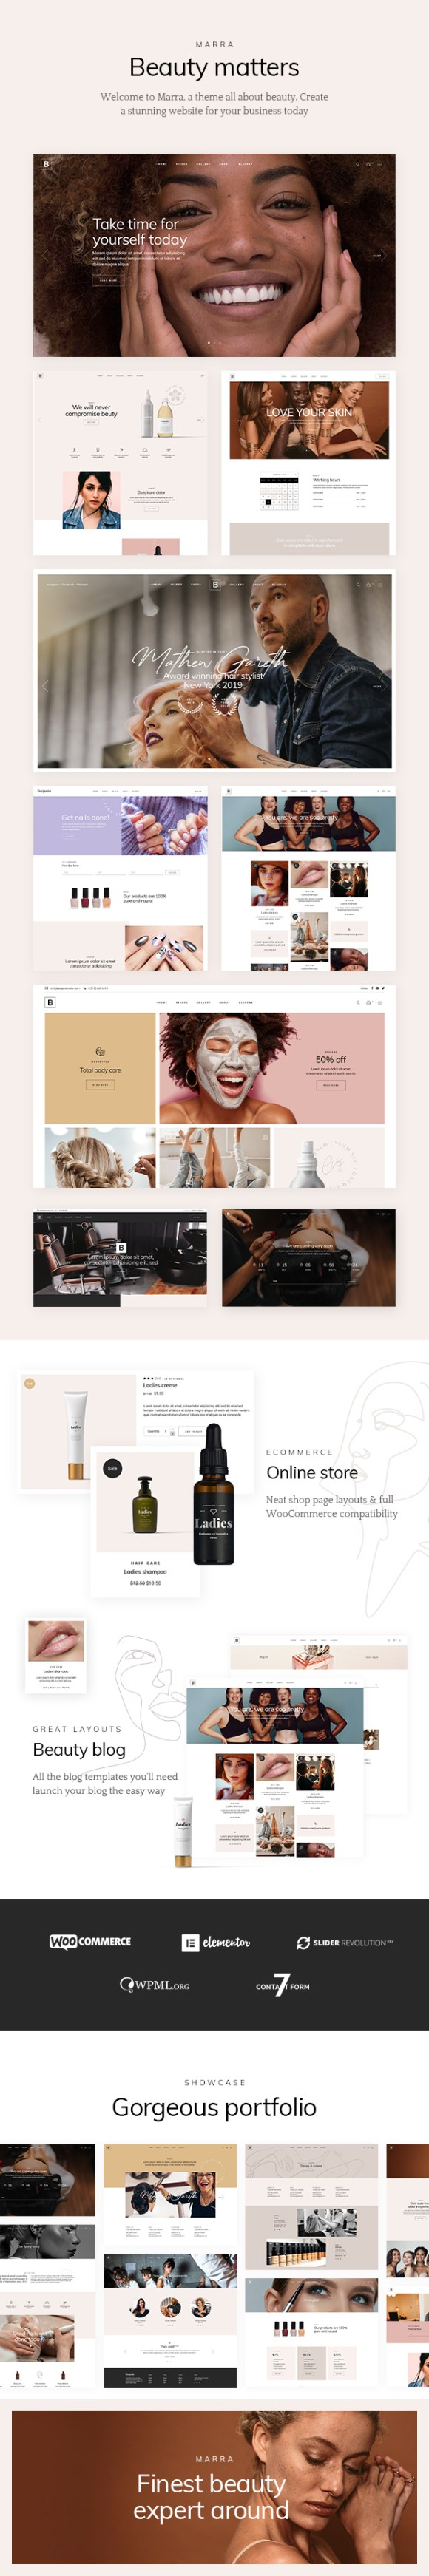 Marra - Beauty WordPress Theme - 1